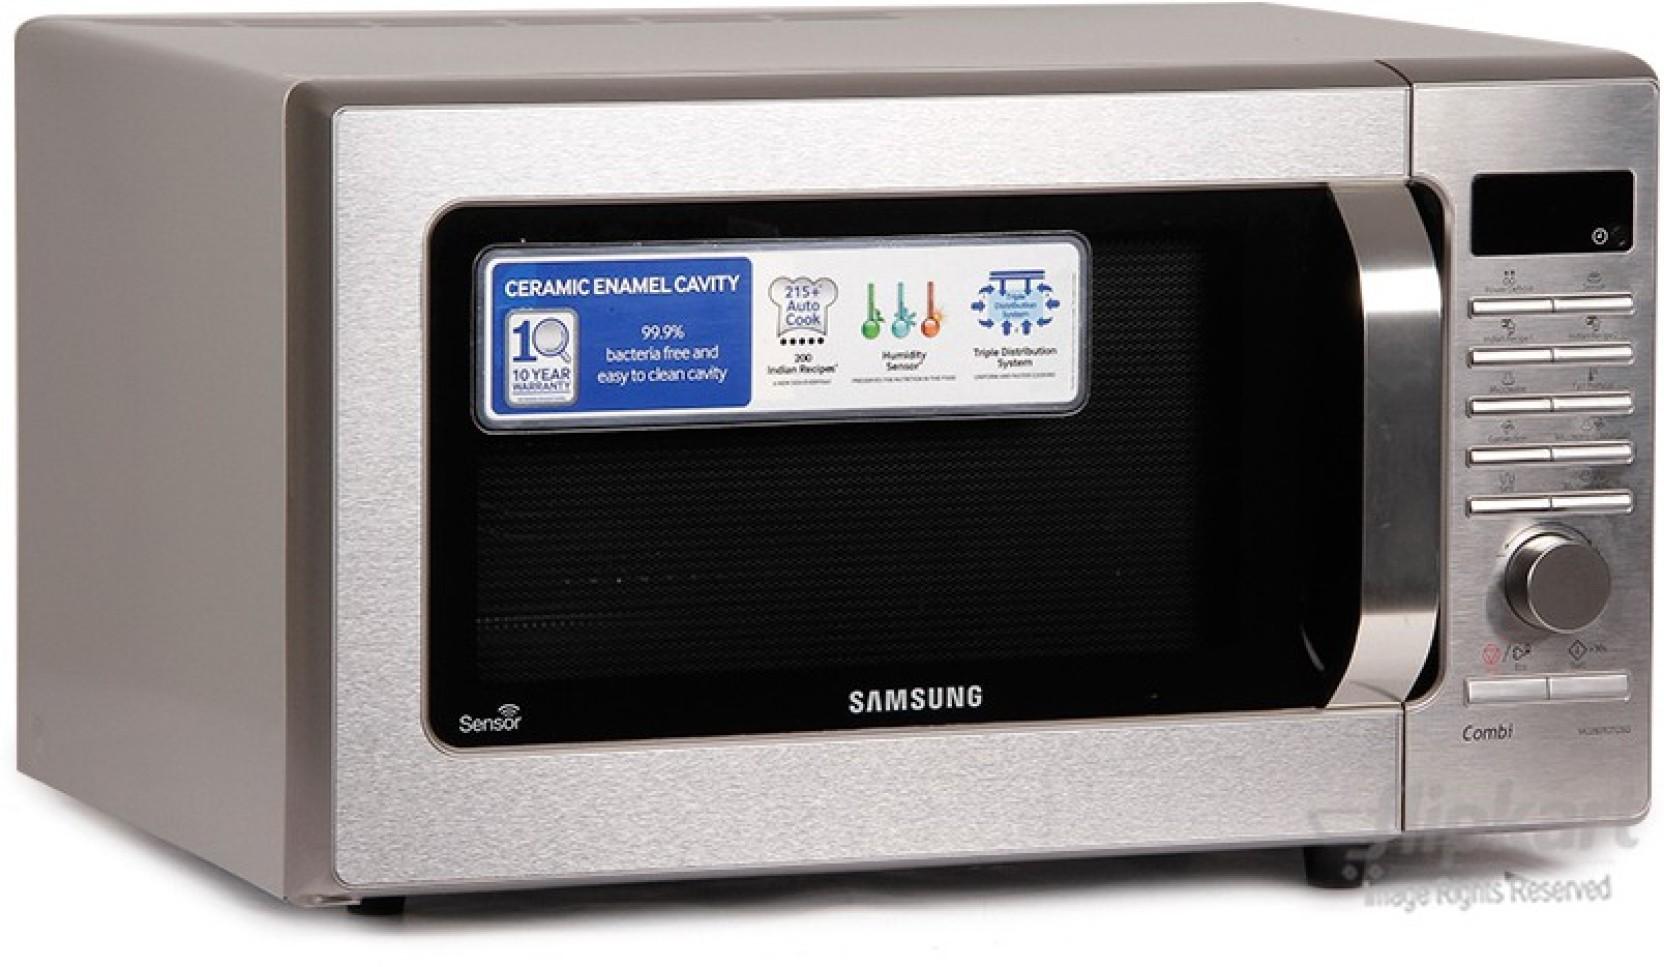 samsung 28 l convection microwave oven. Black Bedroom Furniture Sets. Home Design Ideas